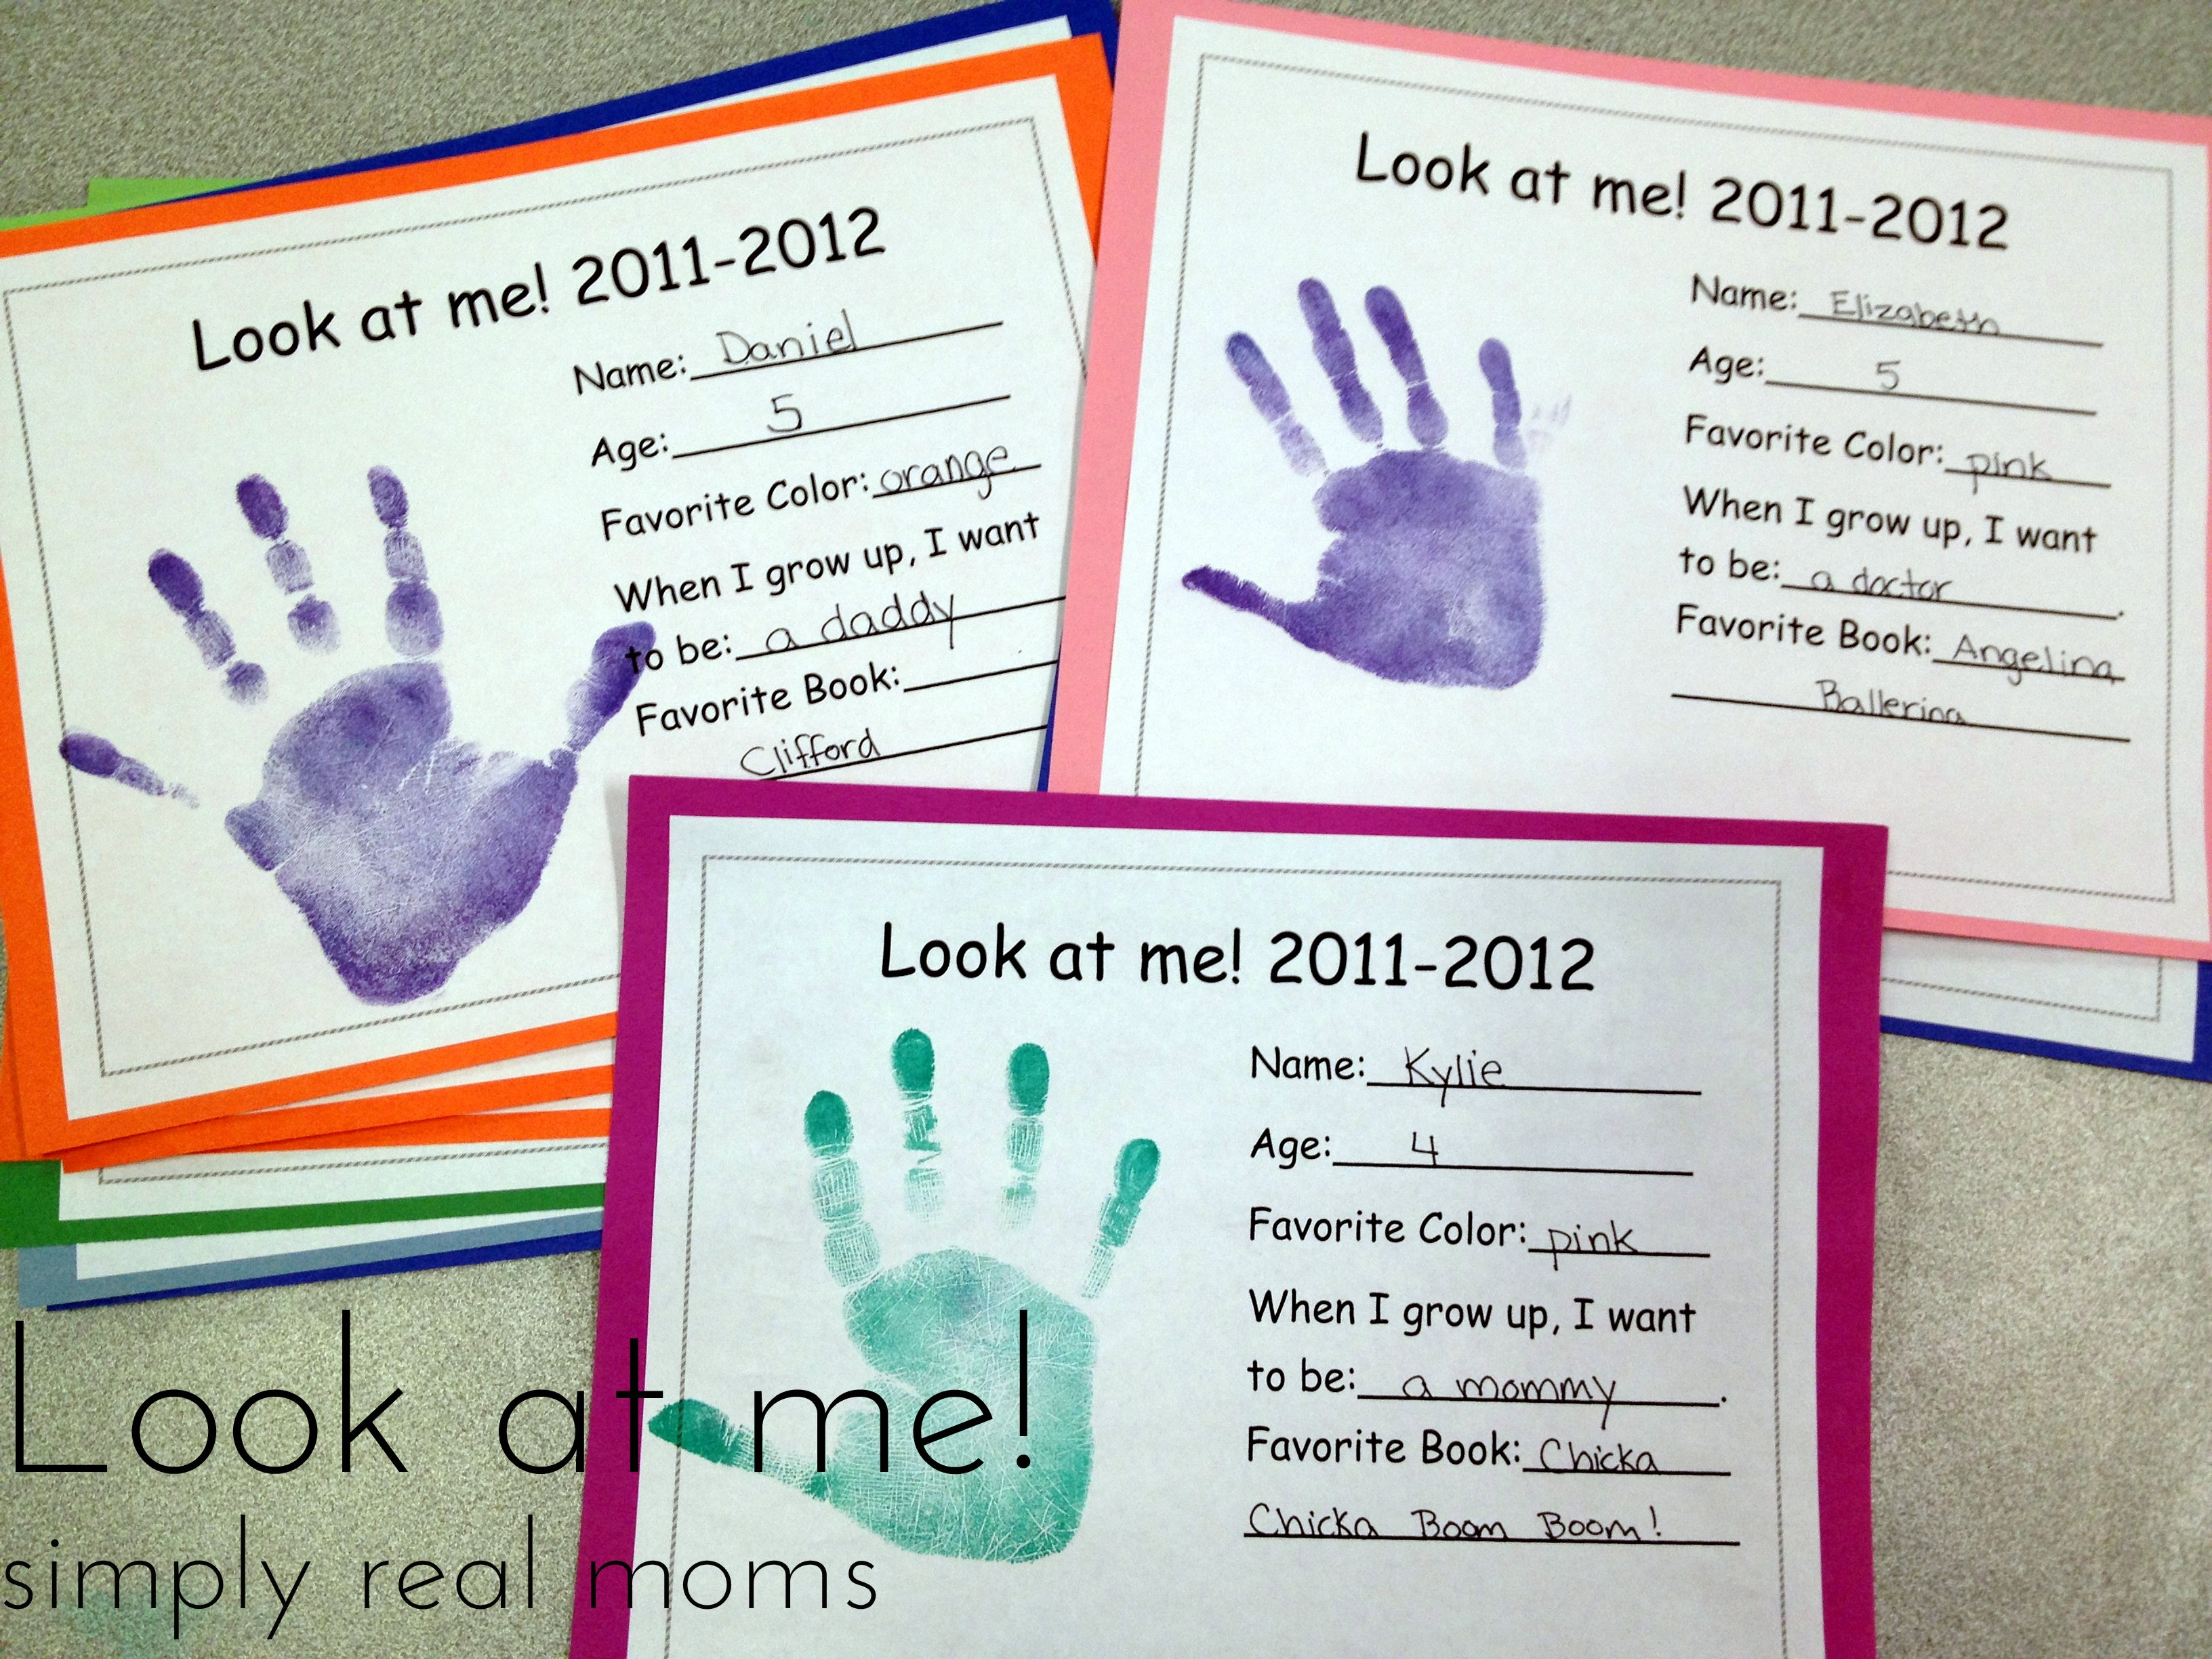 Look At Me With Free Printable - Simply Real Moms - Free Printable Preschool Memory Book